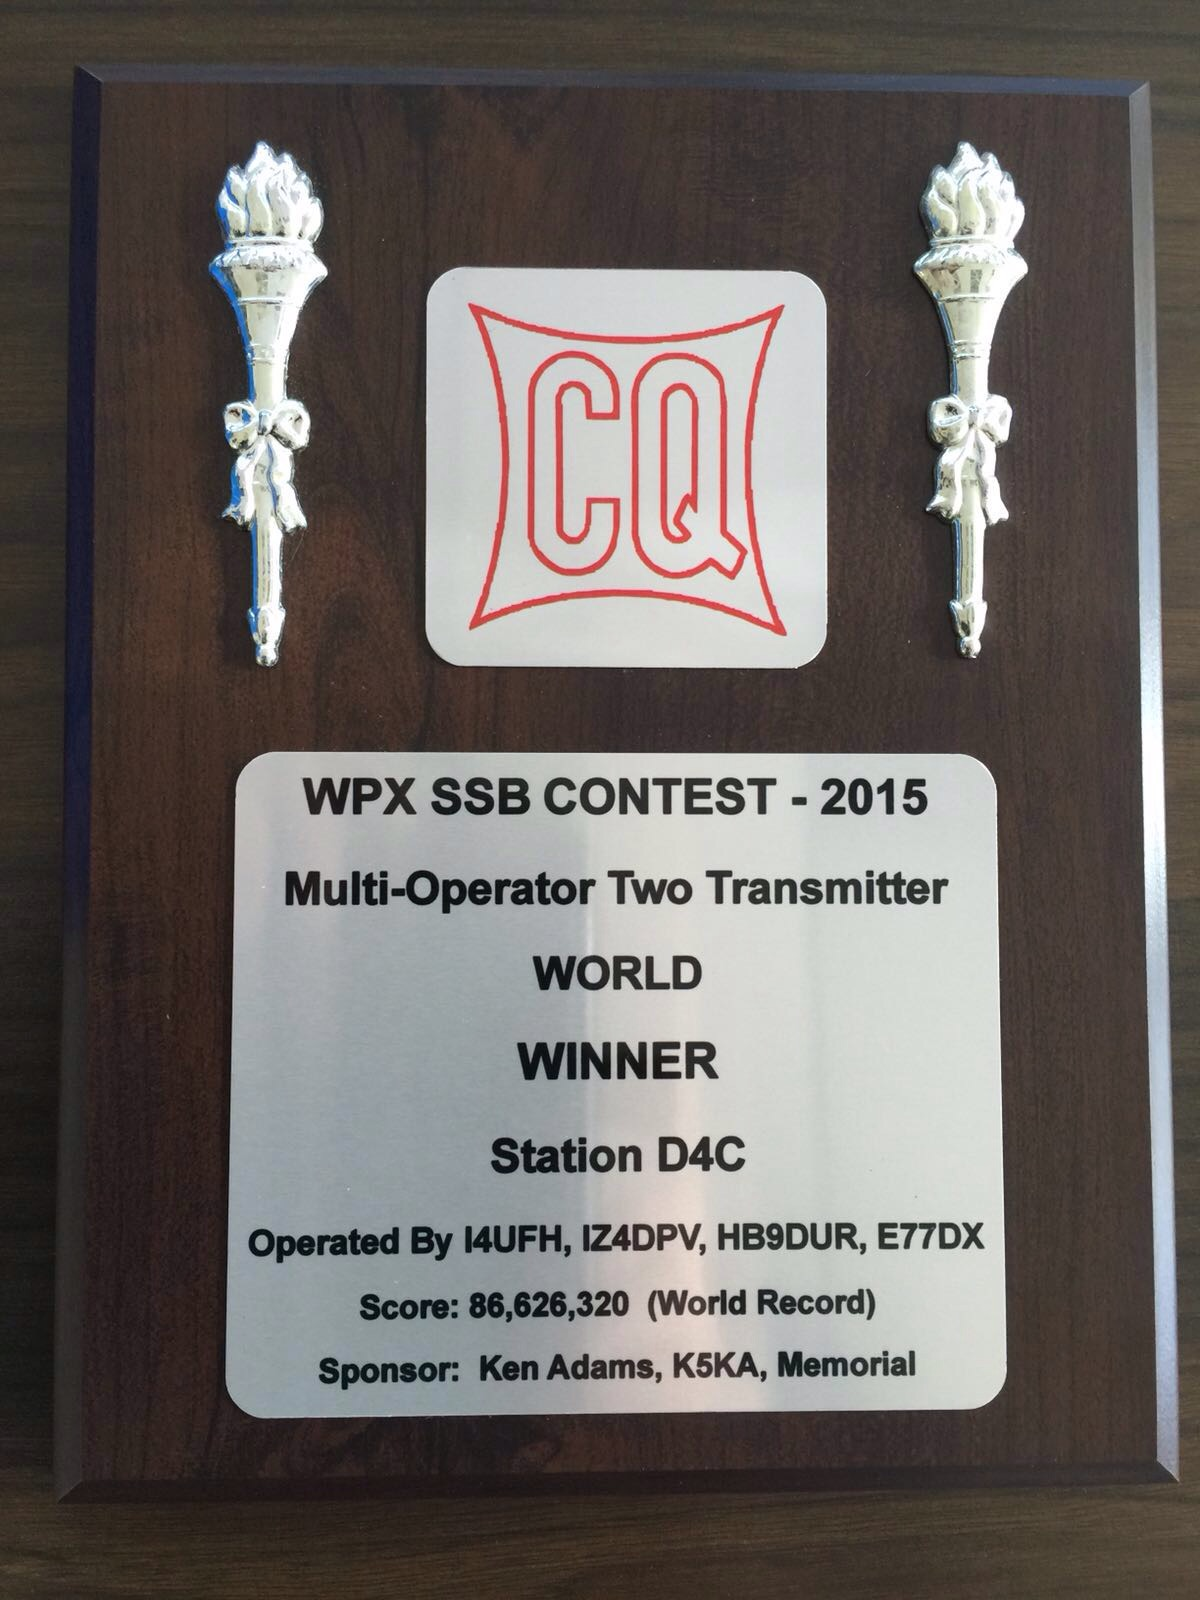 CQWPX SSB 2015 WORLD WIDE record atD4C